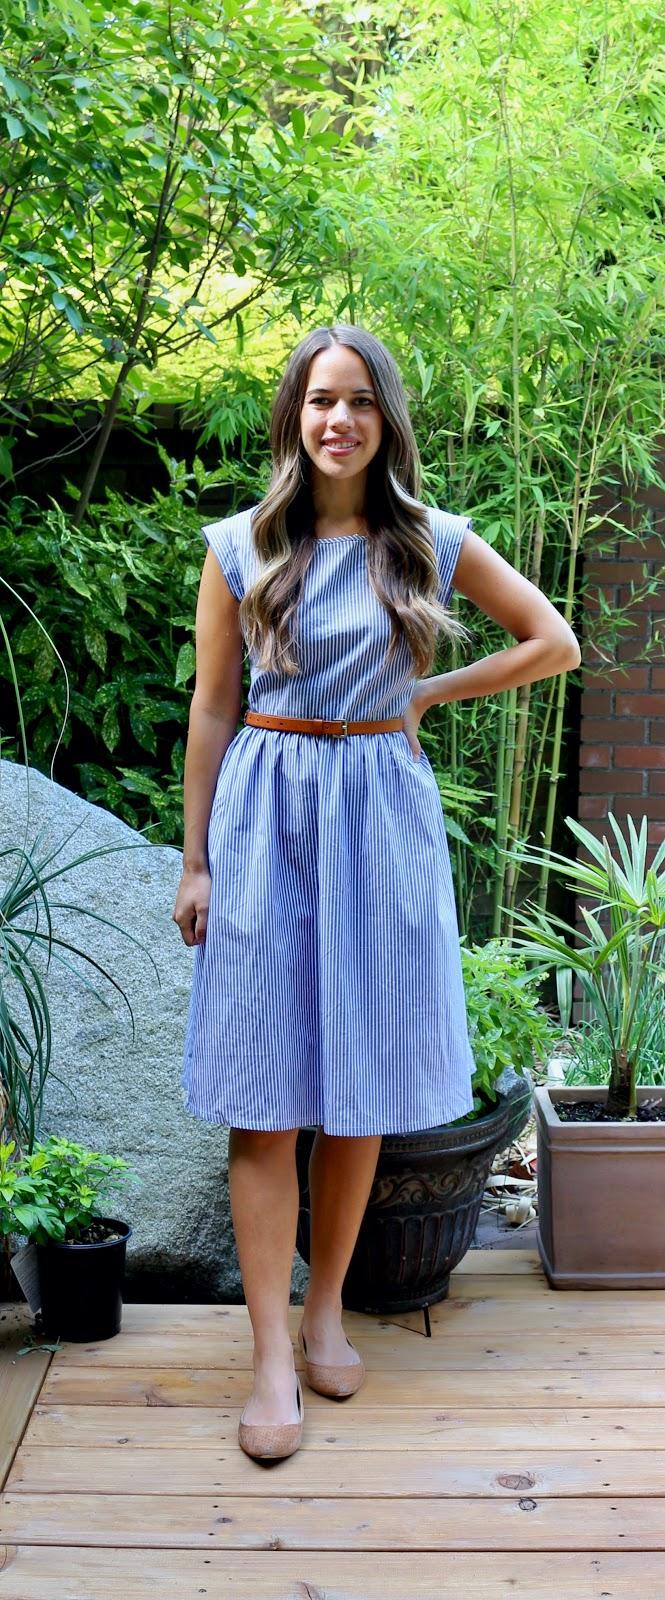 Jules in Flats - Stripe Midi Dress (Business Casual Workwear on a Budget)